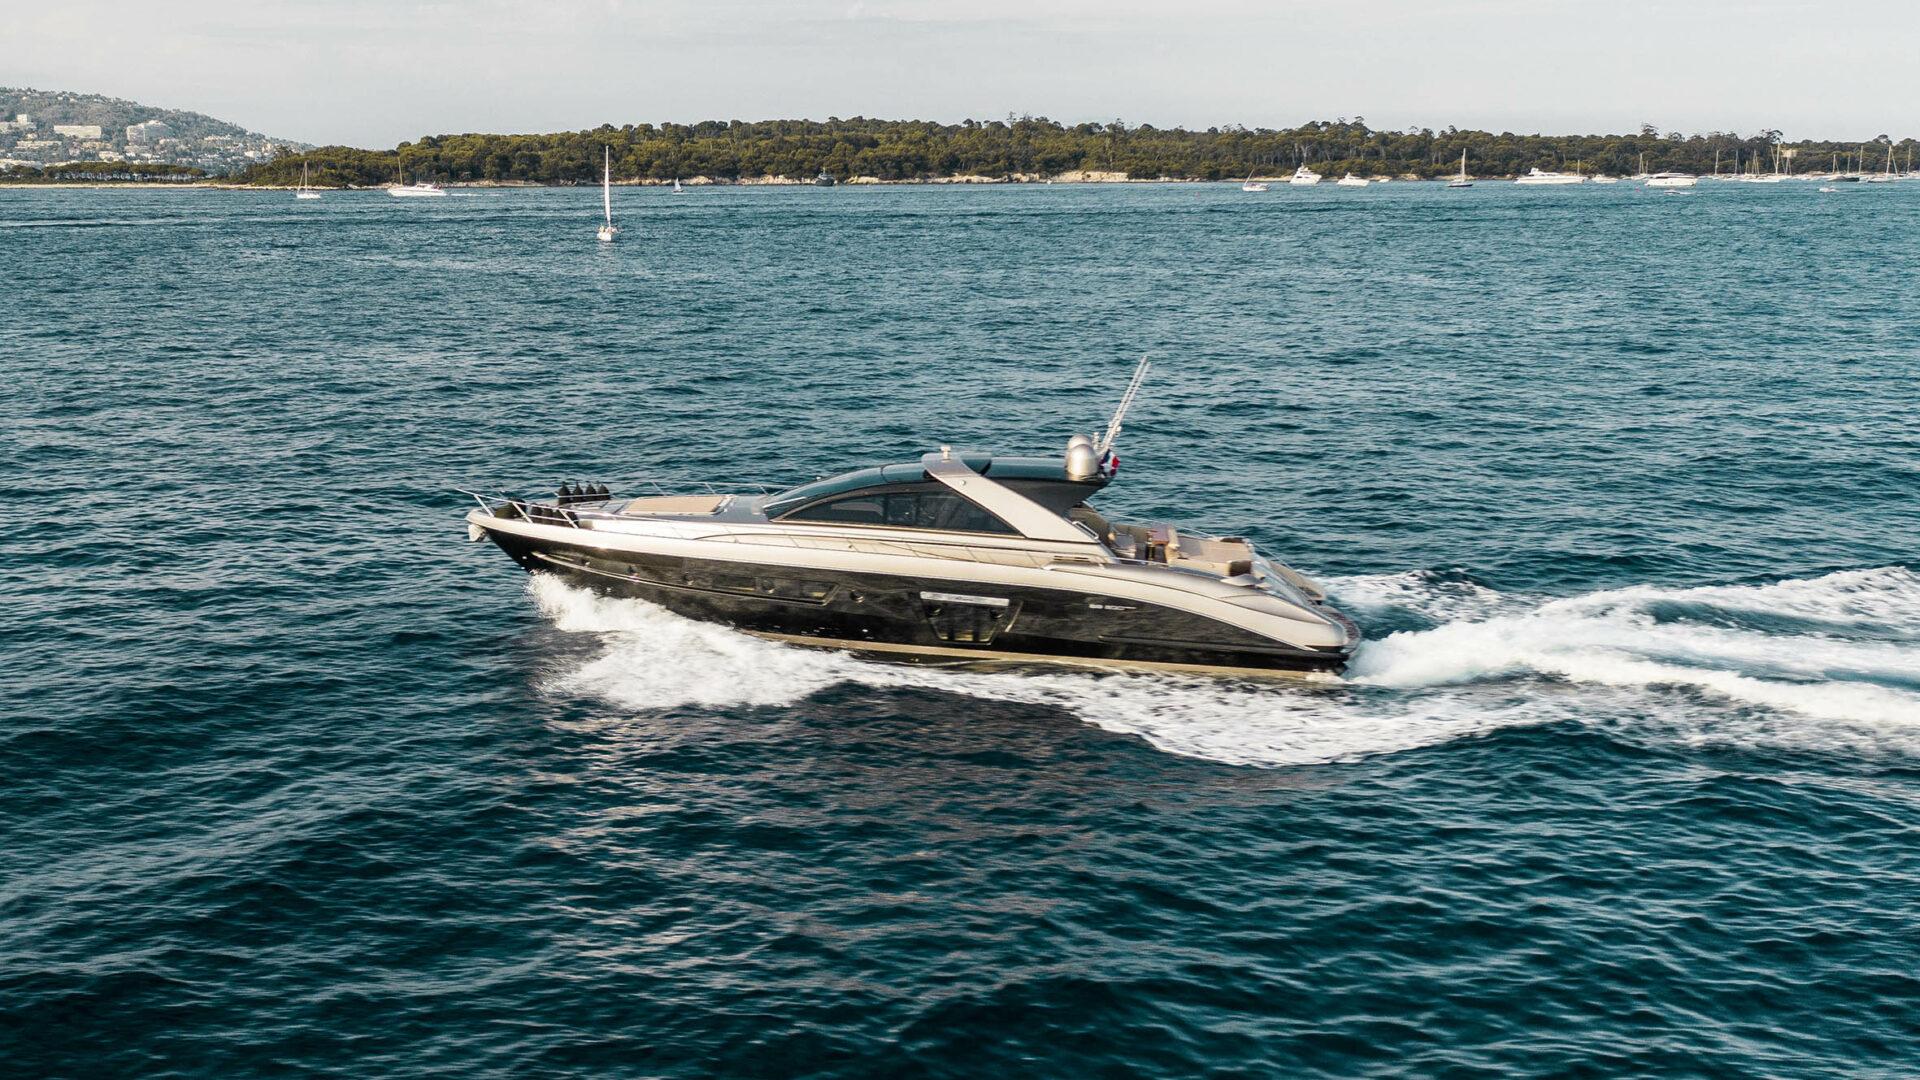 https://lengersyachts.com/wp-content/uploads/2018/09/Riva-Ego-Super-20-exterior-Lengers-Yachts-4-1920x1080.jpg